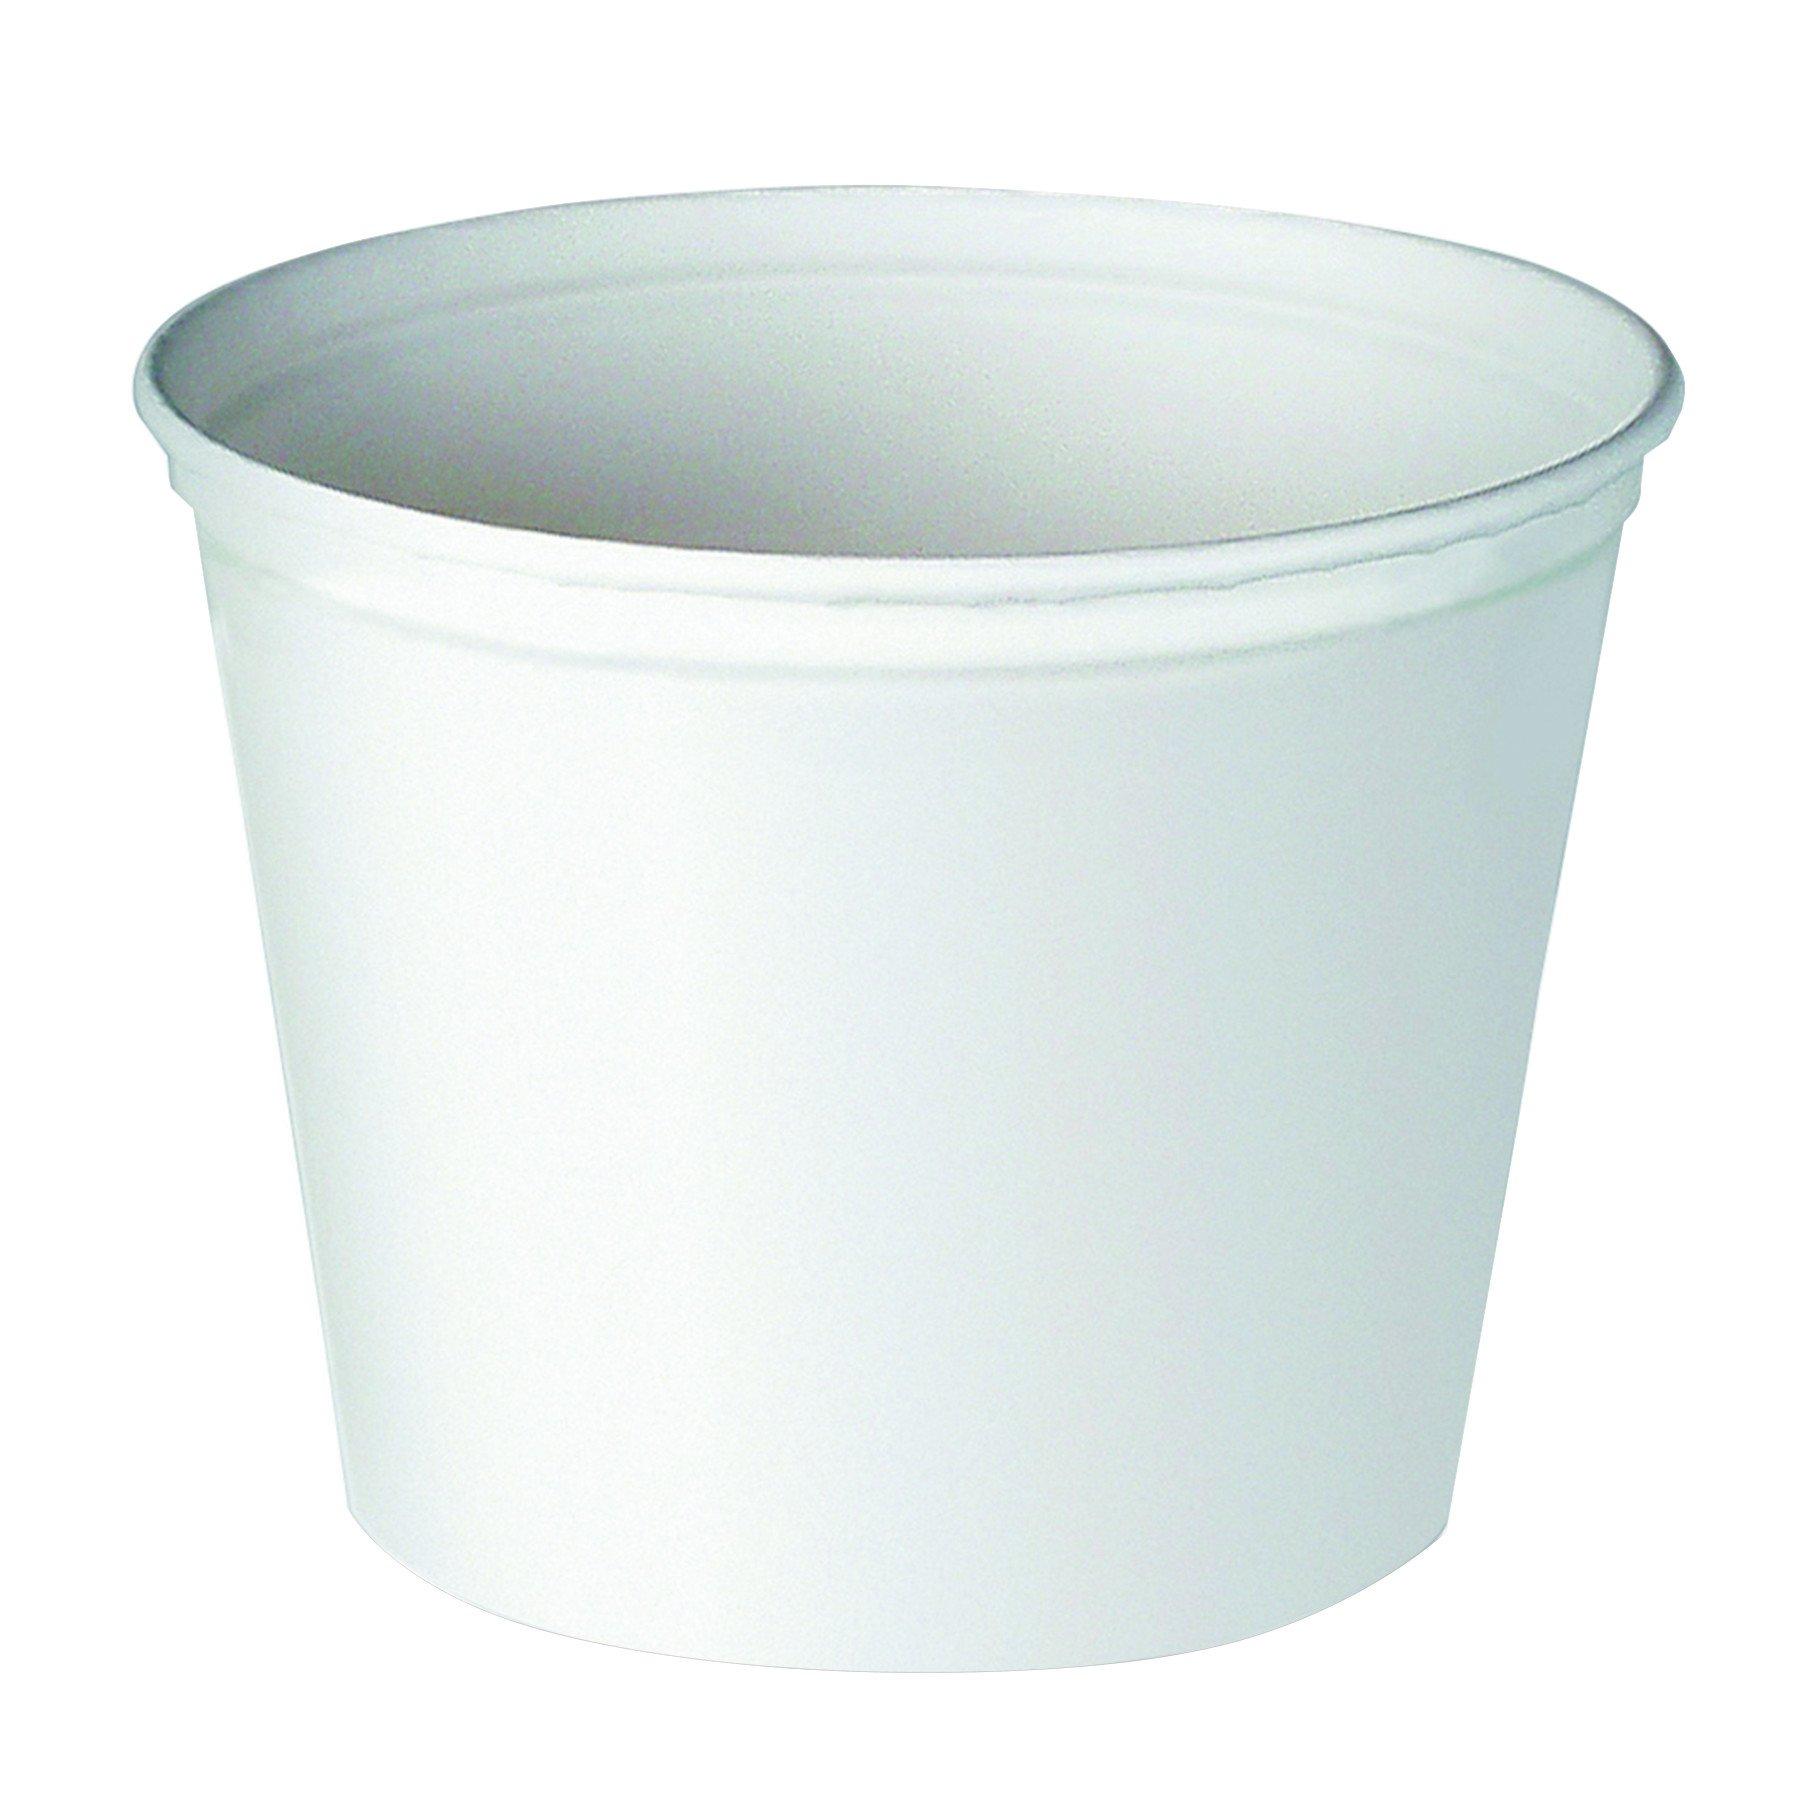 Solo 10T3-N0199 165 oz Unprinted Paper Bucket (Case of 100)